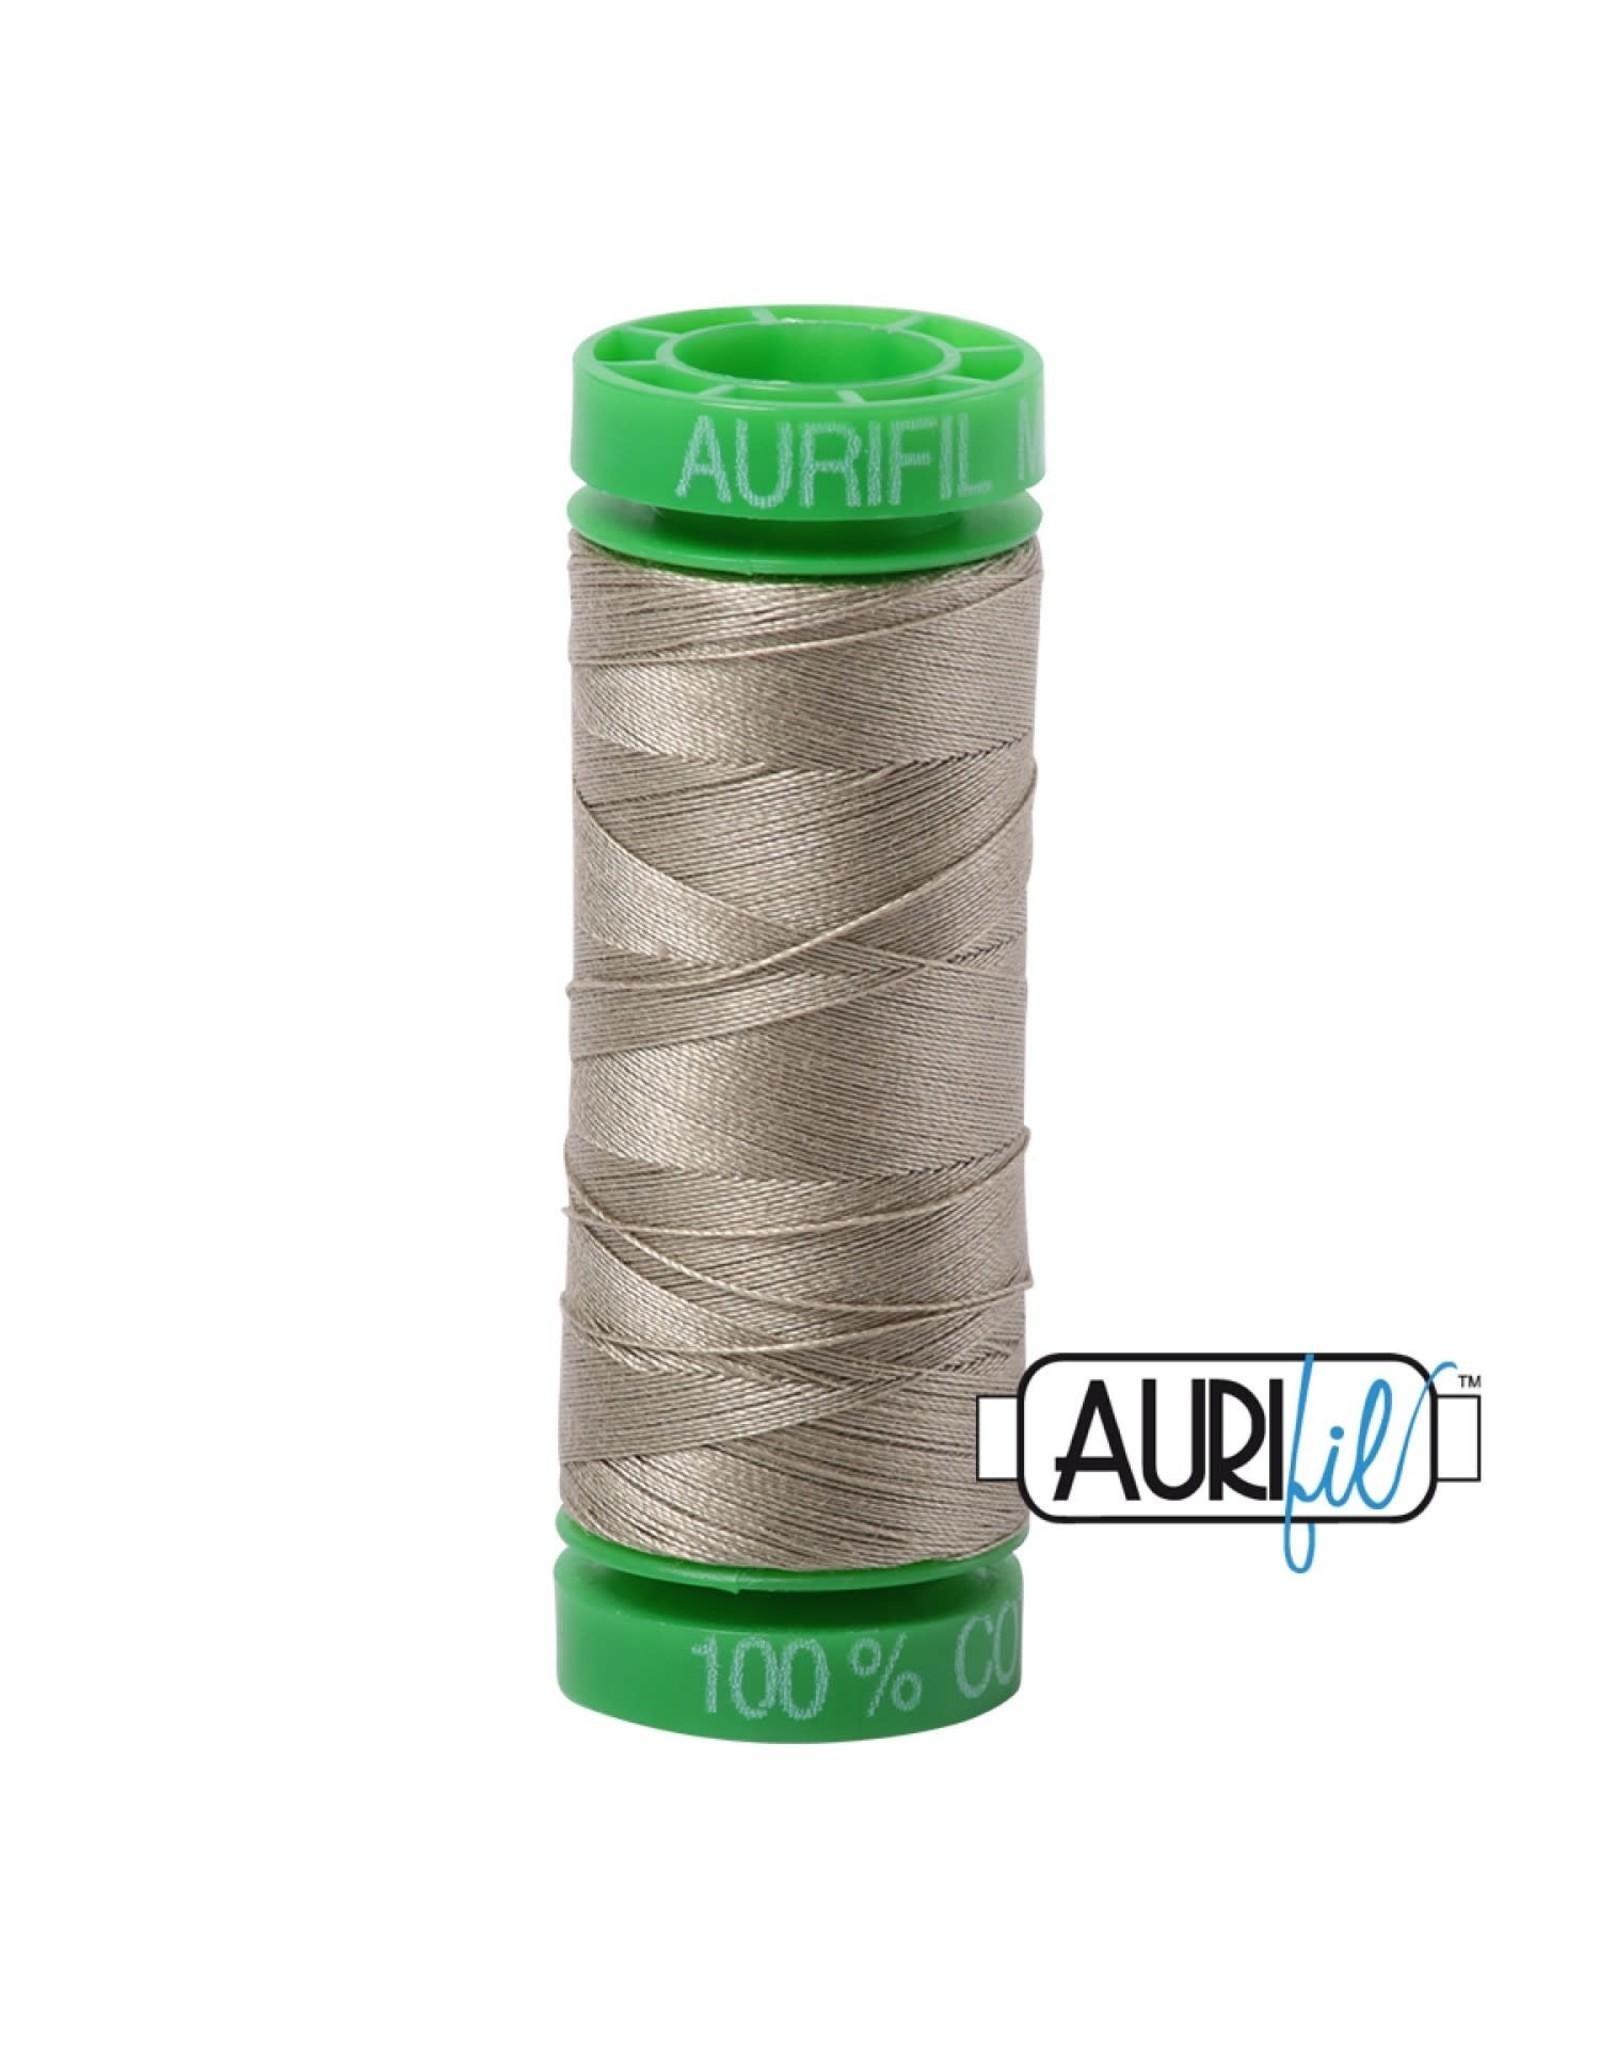 Aurifil Mako 40 - 150 m 2900 - Light Kakhy Green